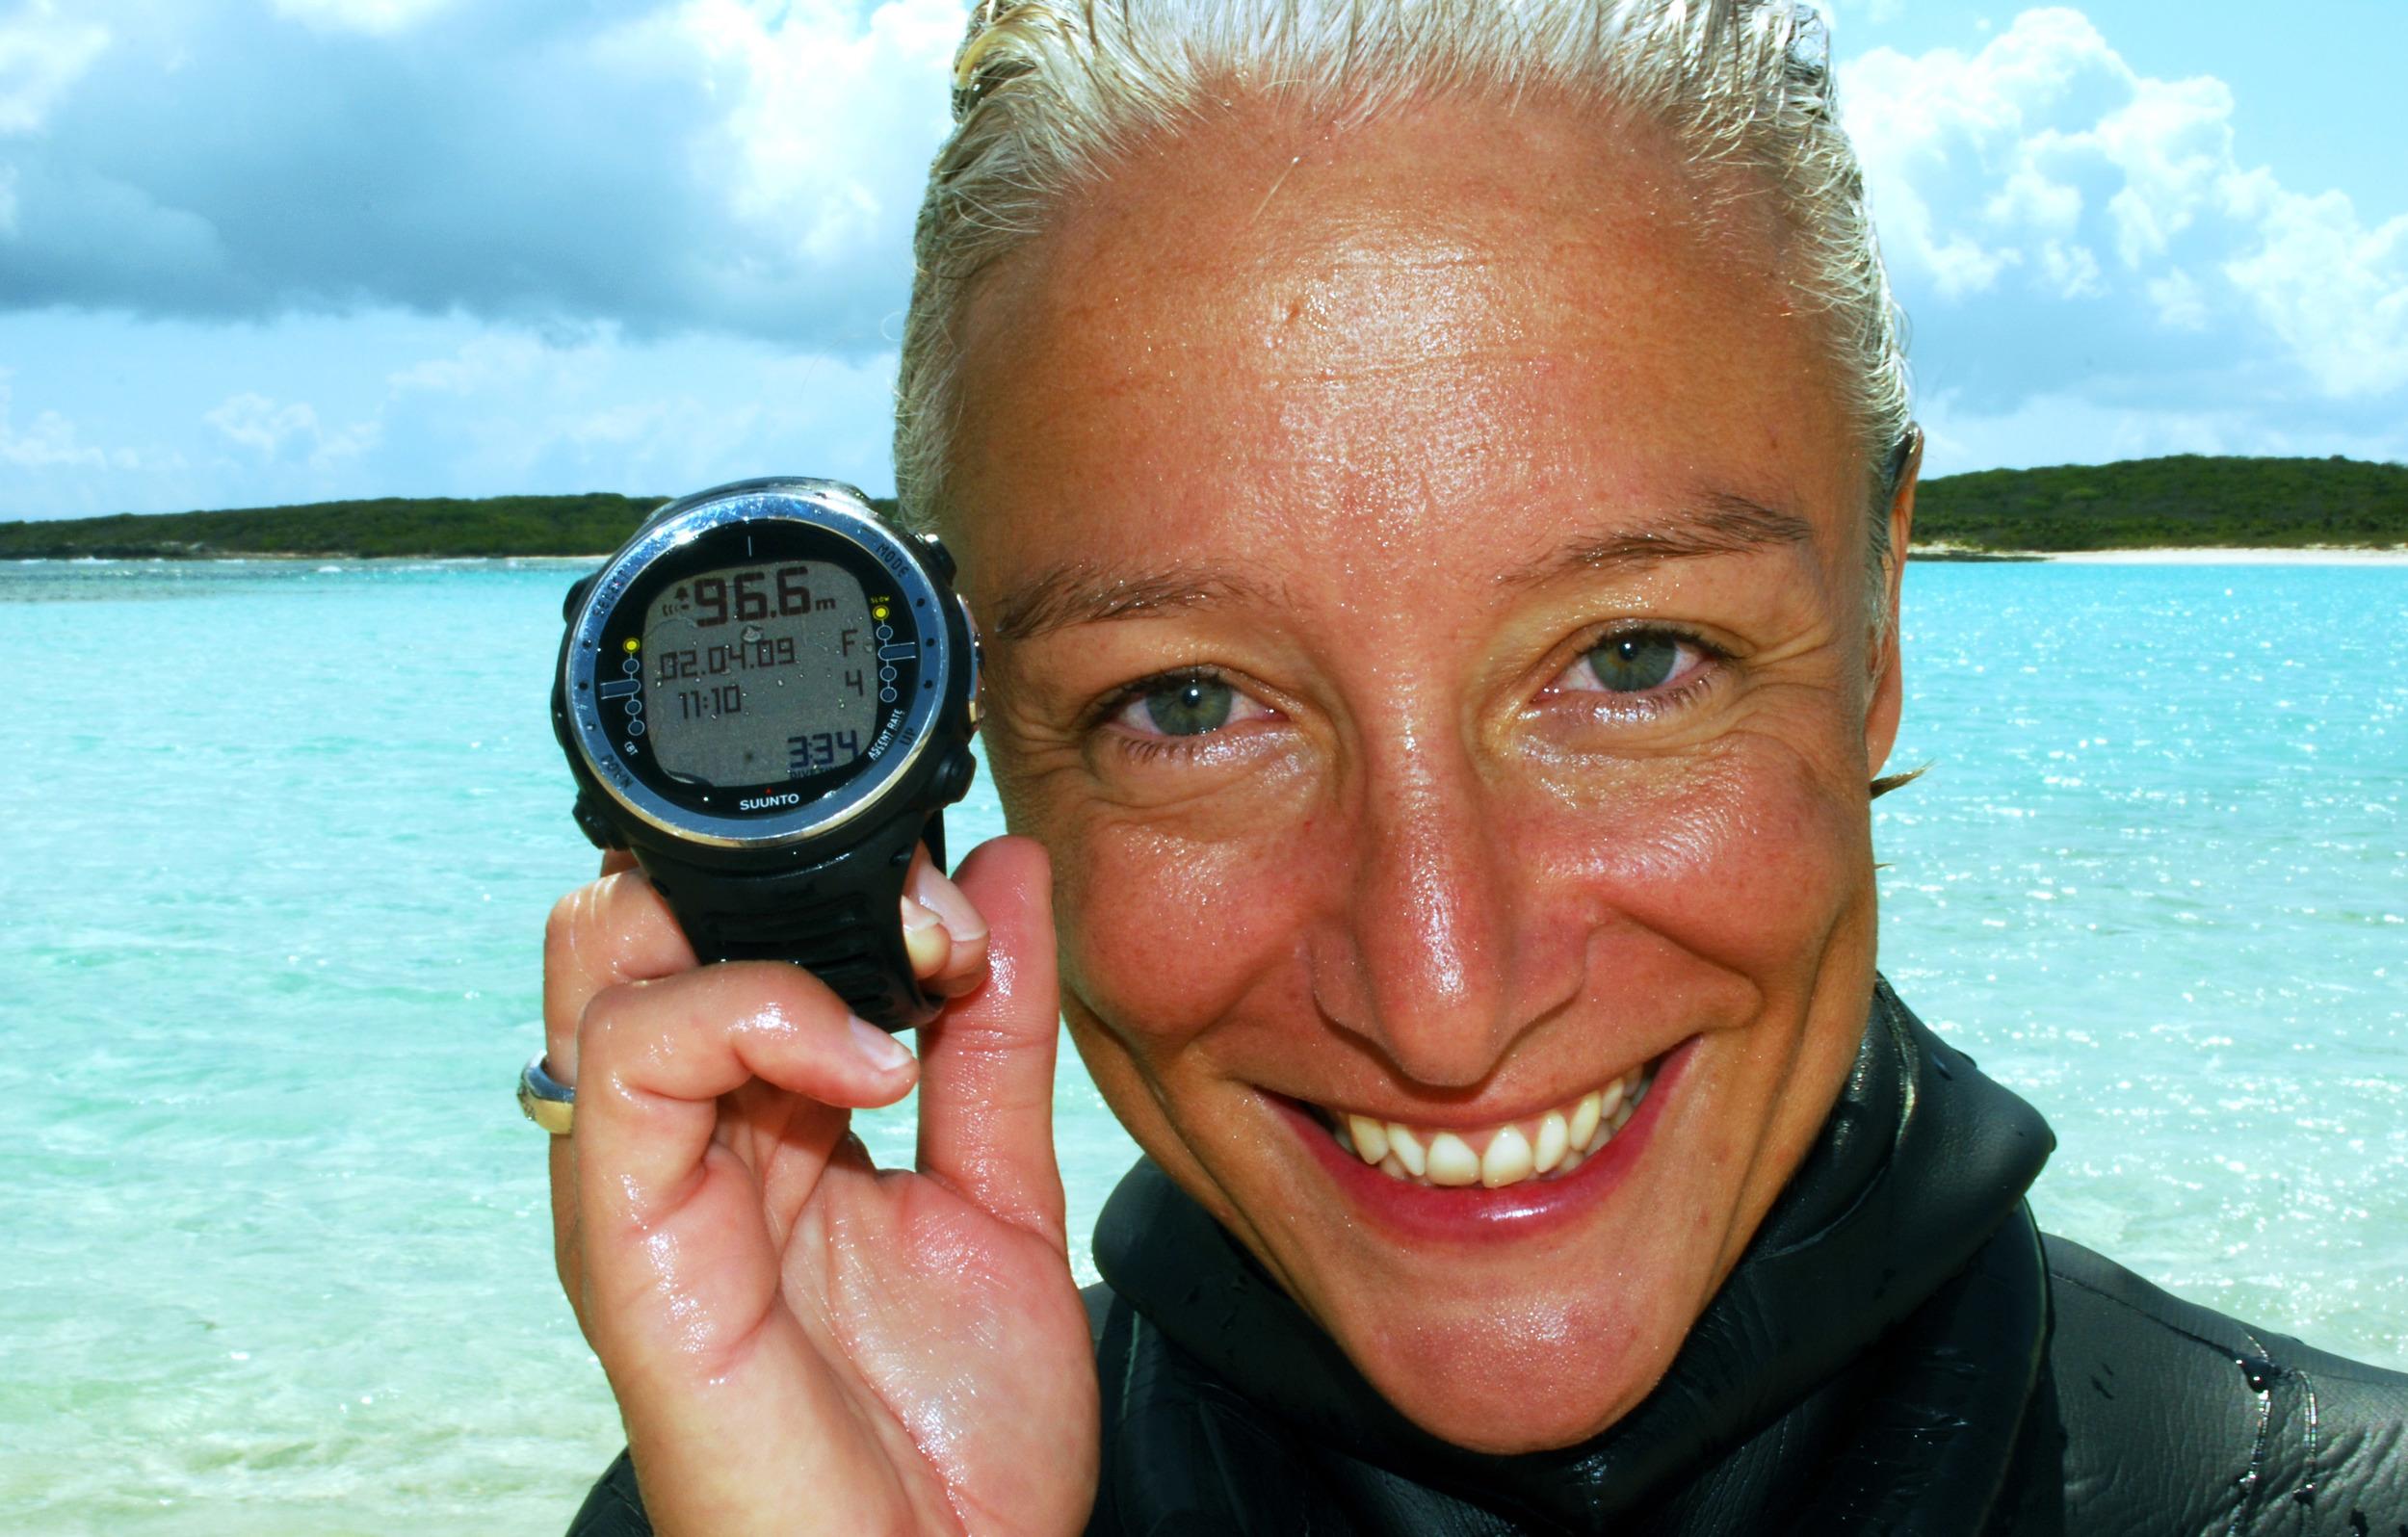 Sara Campbell 96m World Record, Credit Blue Eye FX.jpg